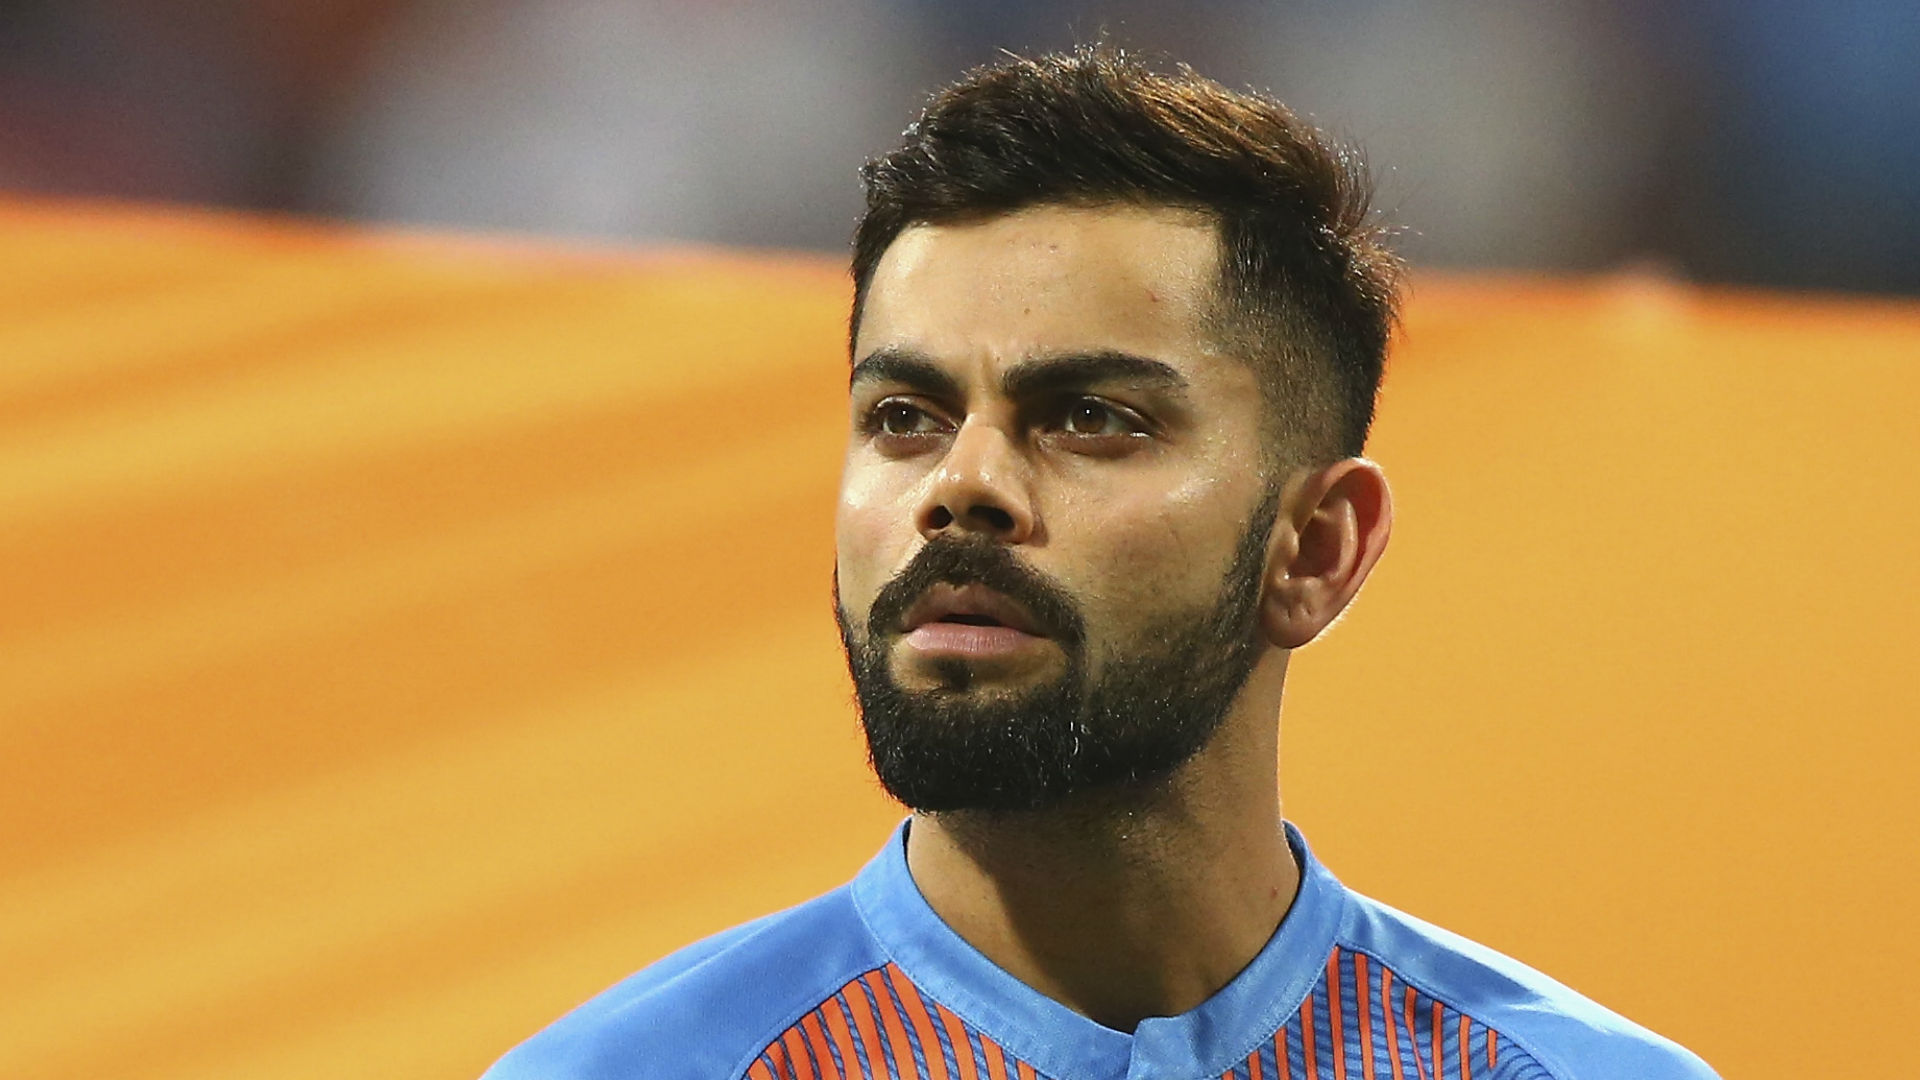 India Captain Virat Kohli No Problems With Anil Kumble Sporting News